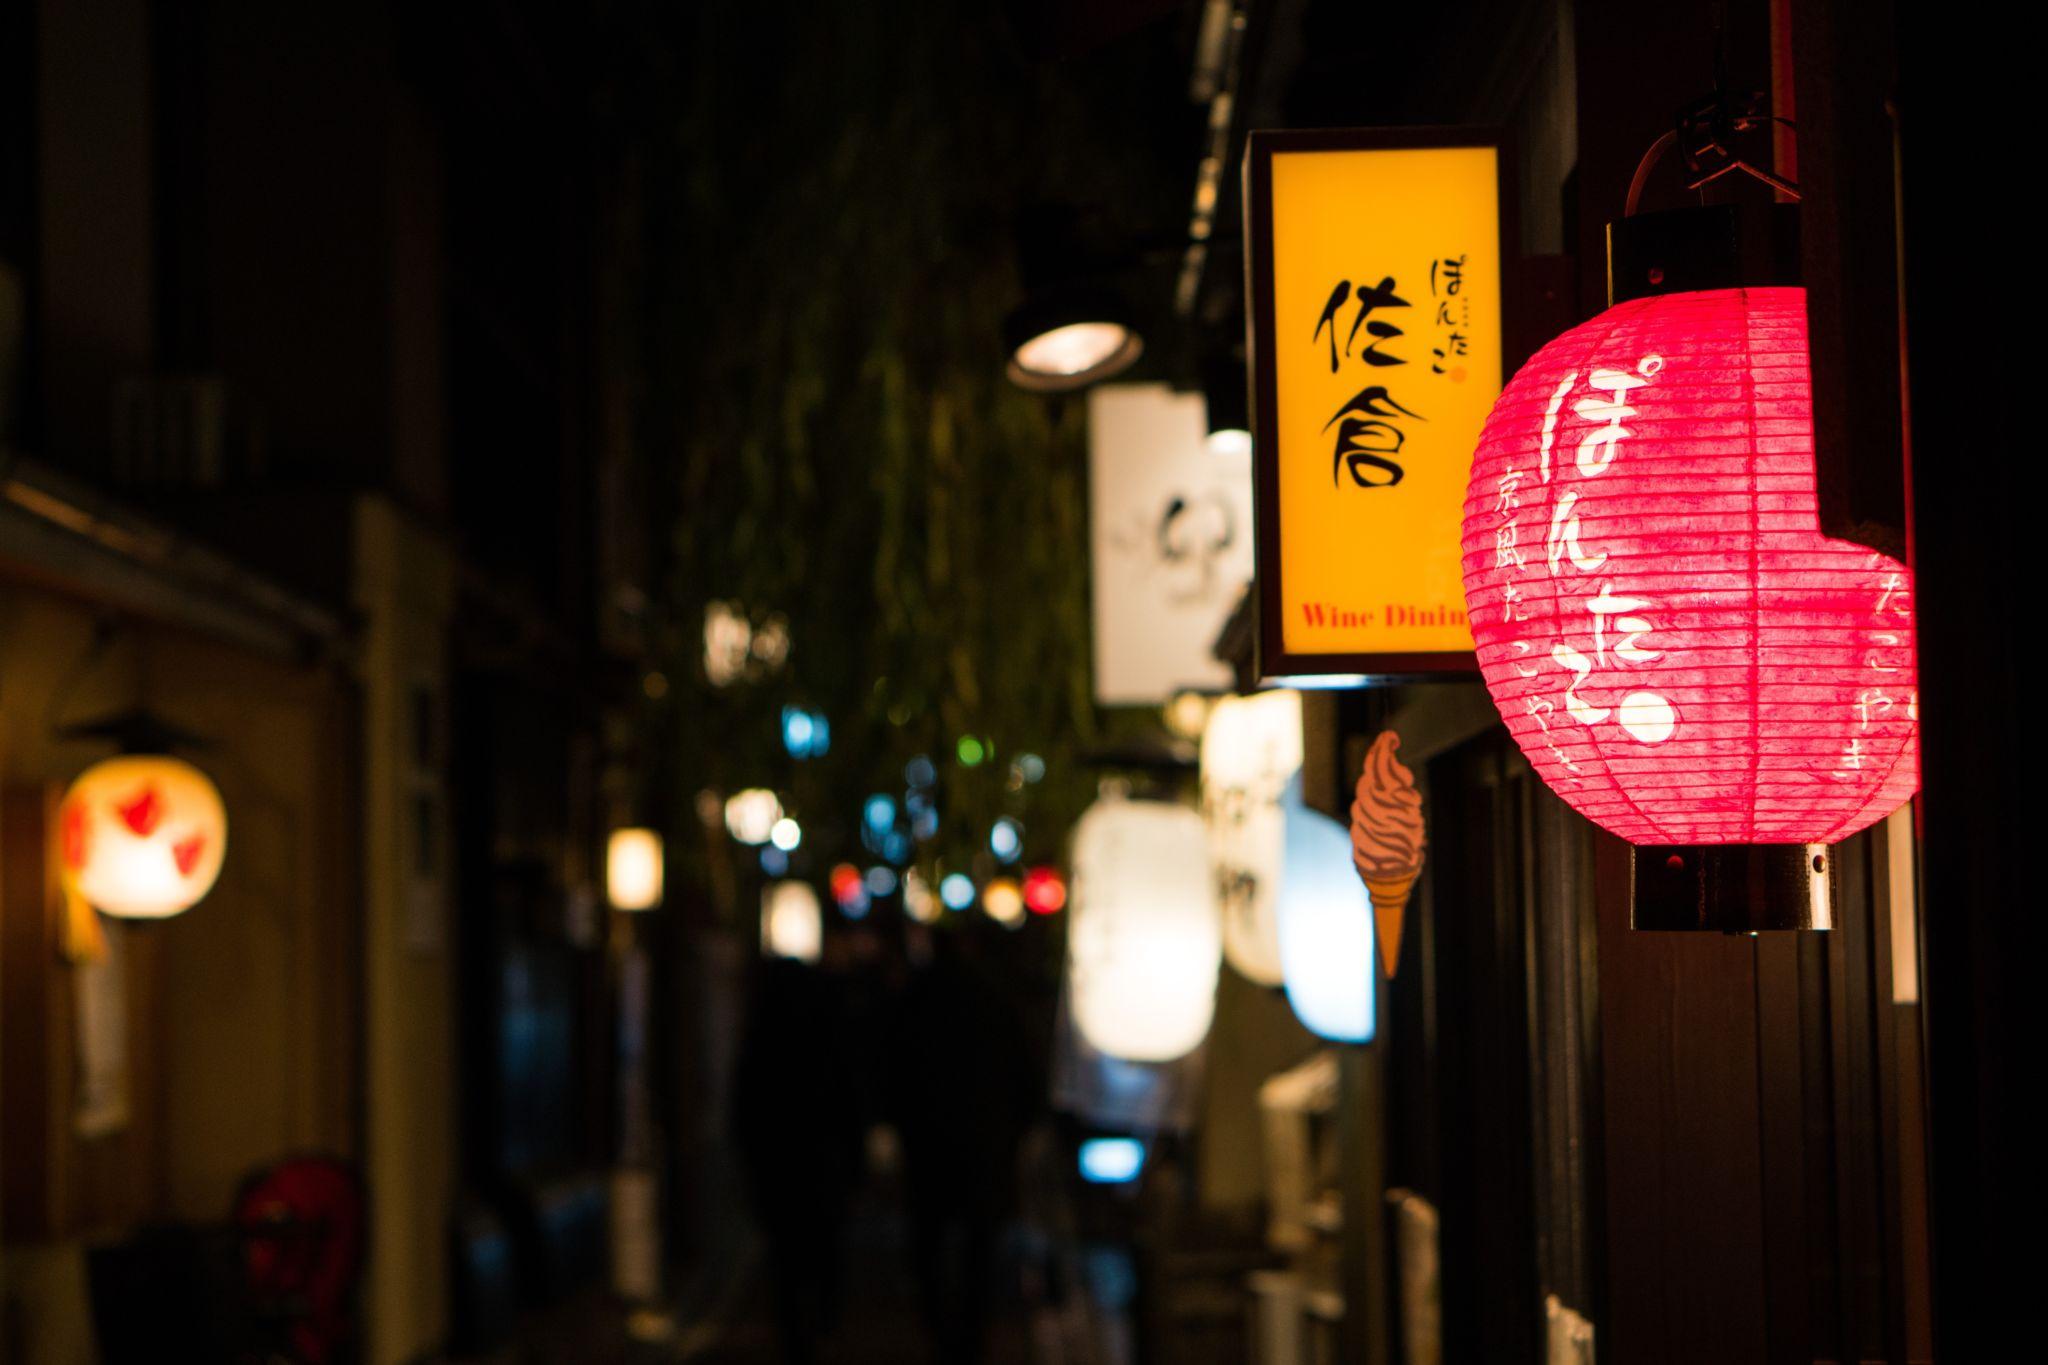 Sehnsuchtsort Japan